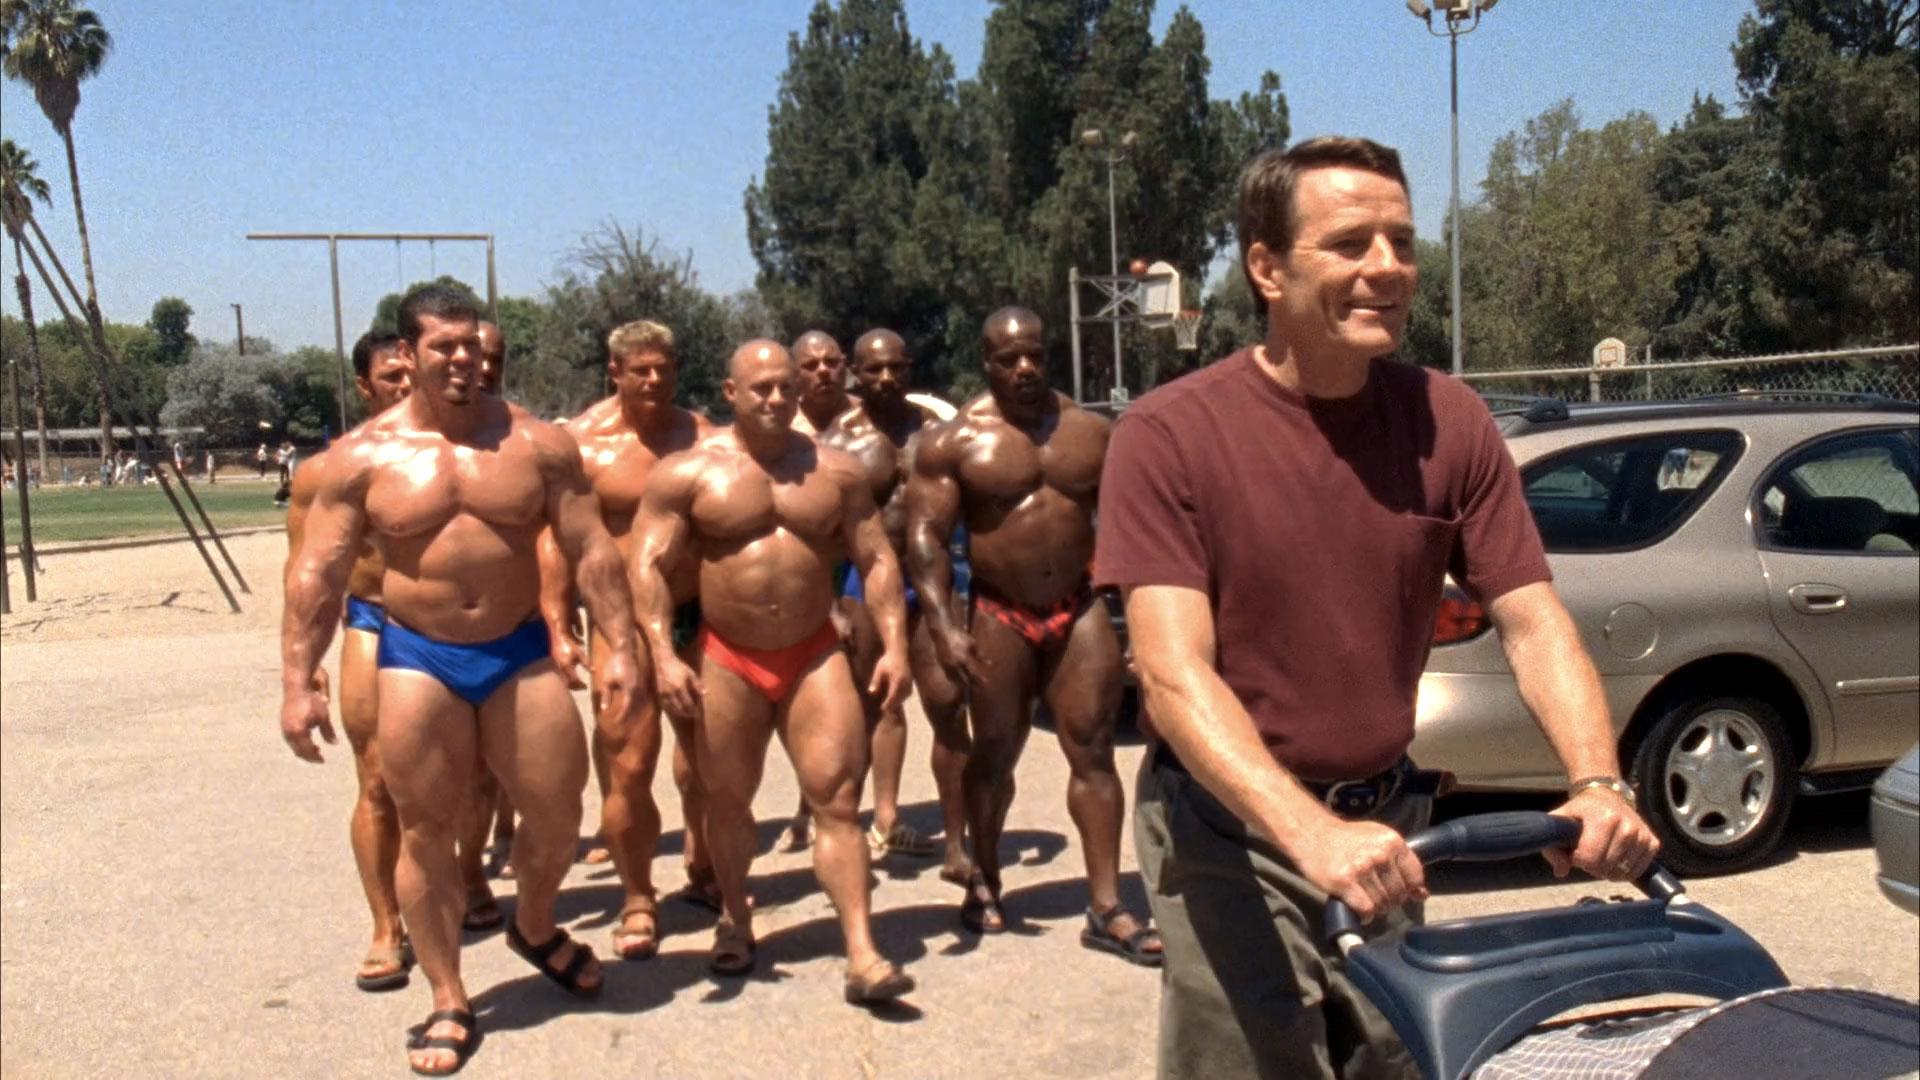 Bob Cicherillo (Walt), Aaron Brumfield (bodybuilder #1),  Rich Piana (bodybuilder #2), Mariano 'Big Dawg' Mendoza (bodybuilder #2 (non crédité)), Christian Boeving (non crédité) et Bryan Cranston (Hal) dans